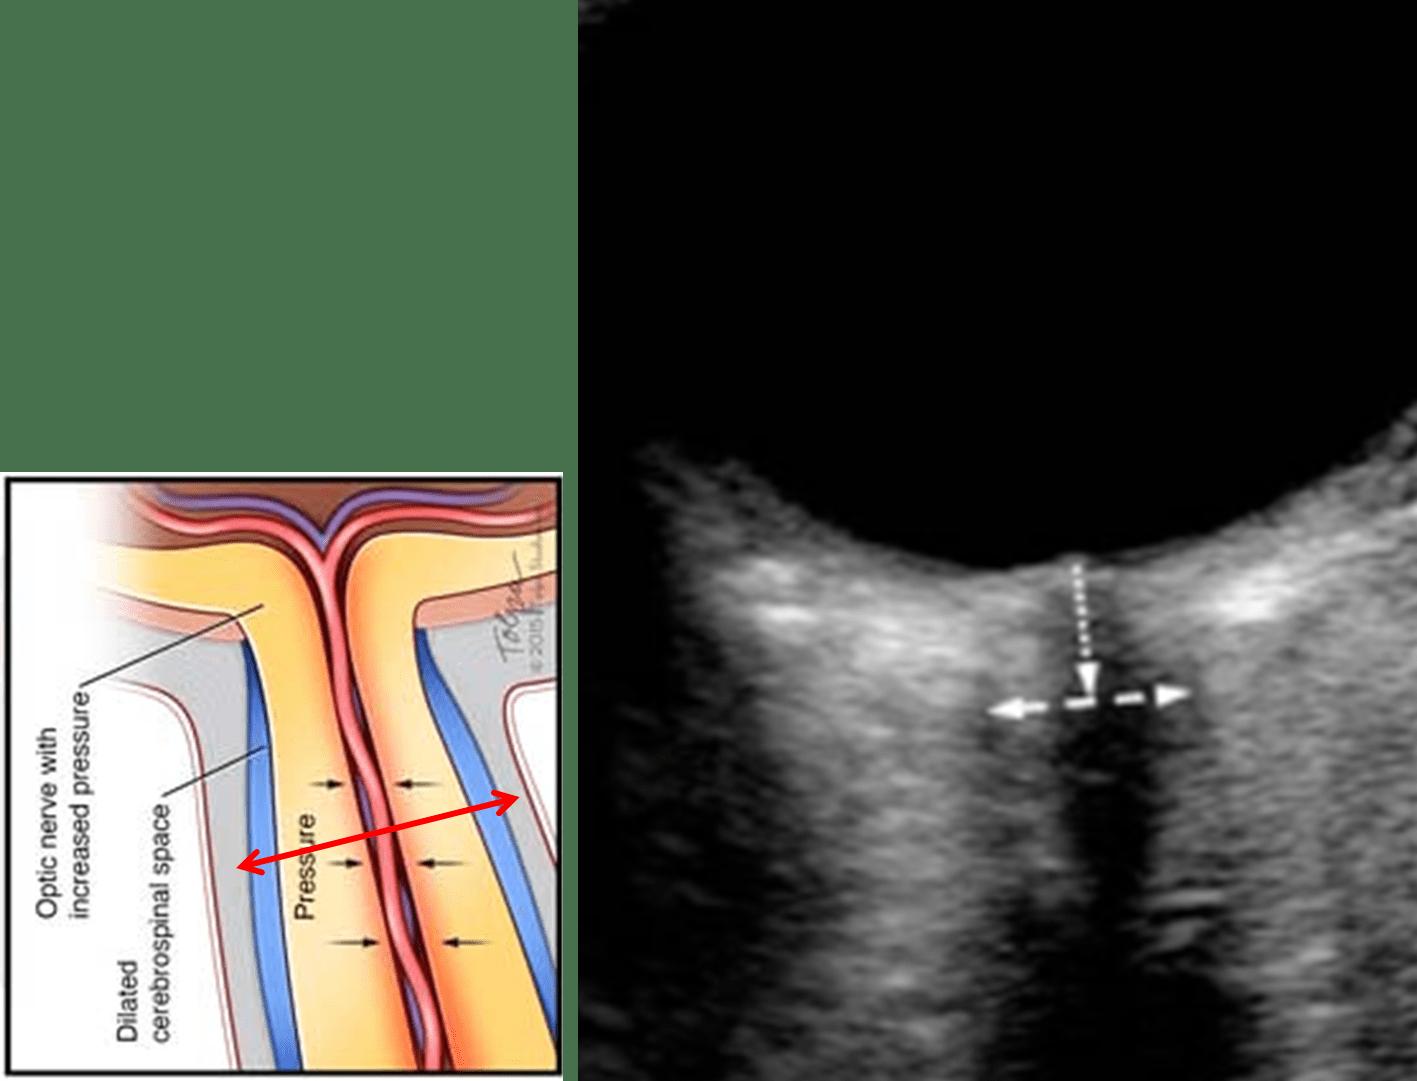 Optic nerve sheath diameter (ONSD)